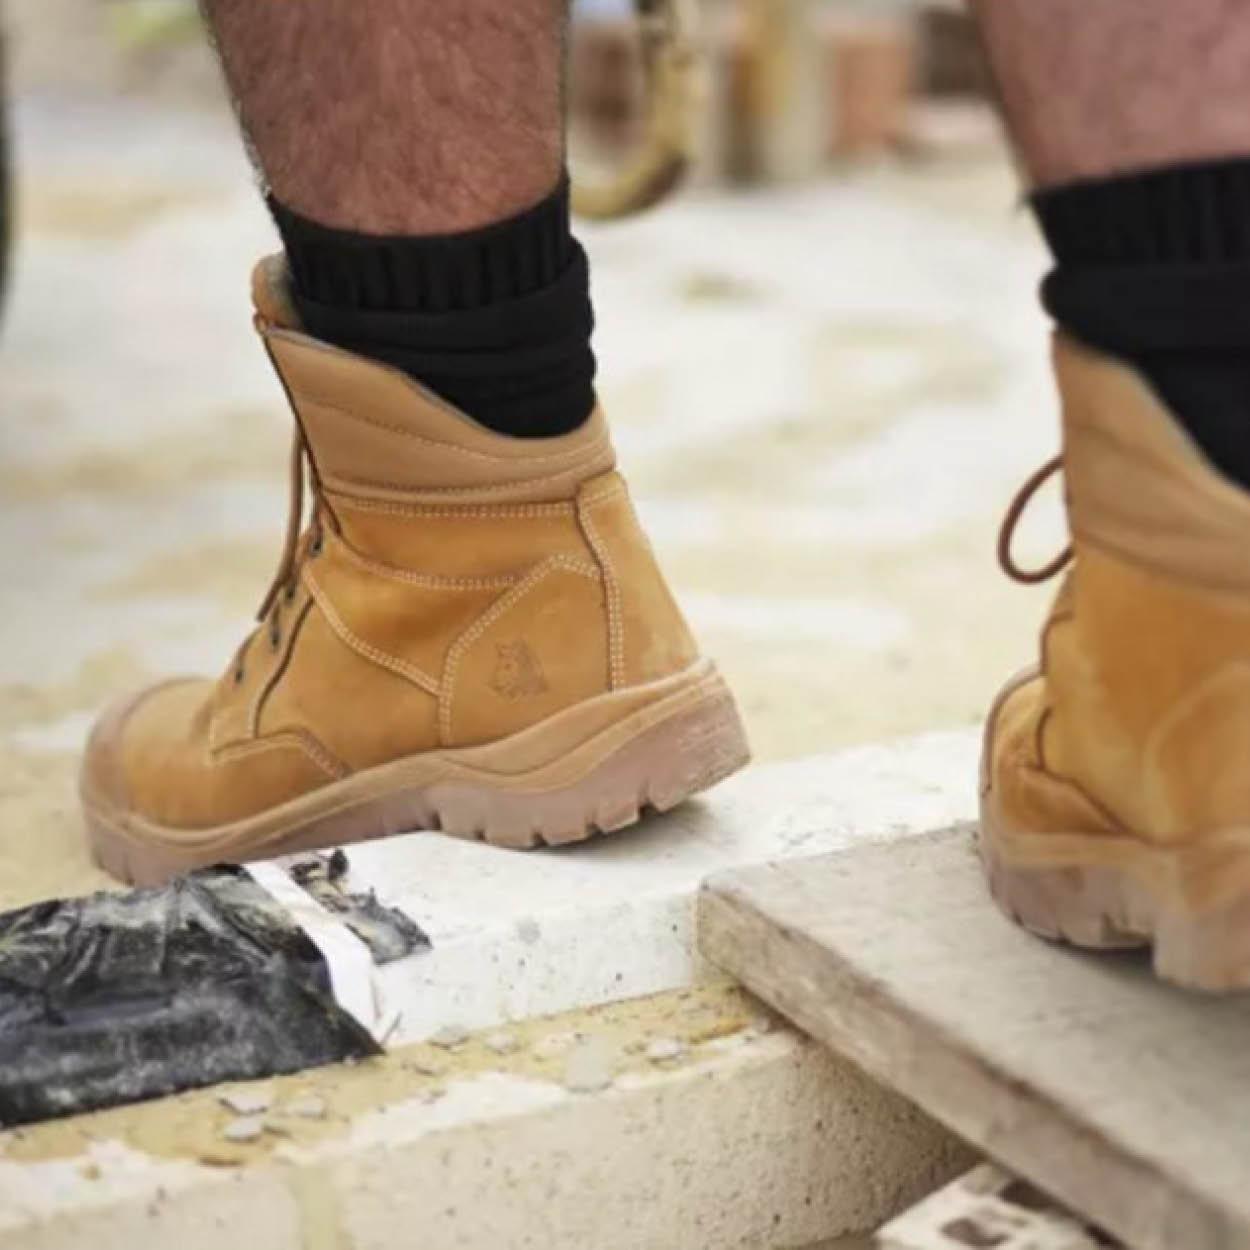 Work Boots.jpg